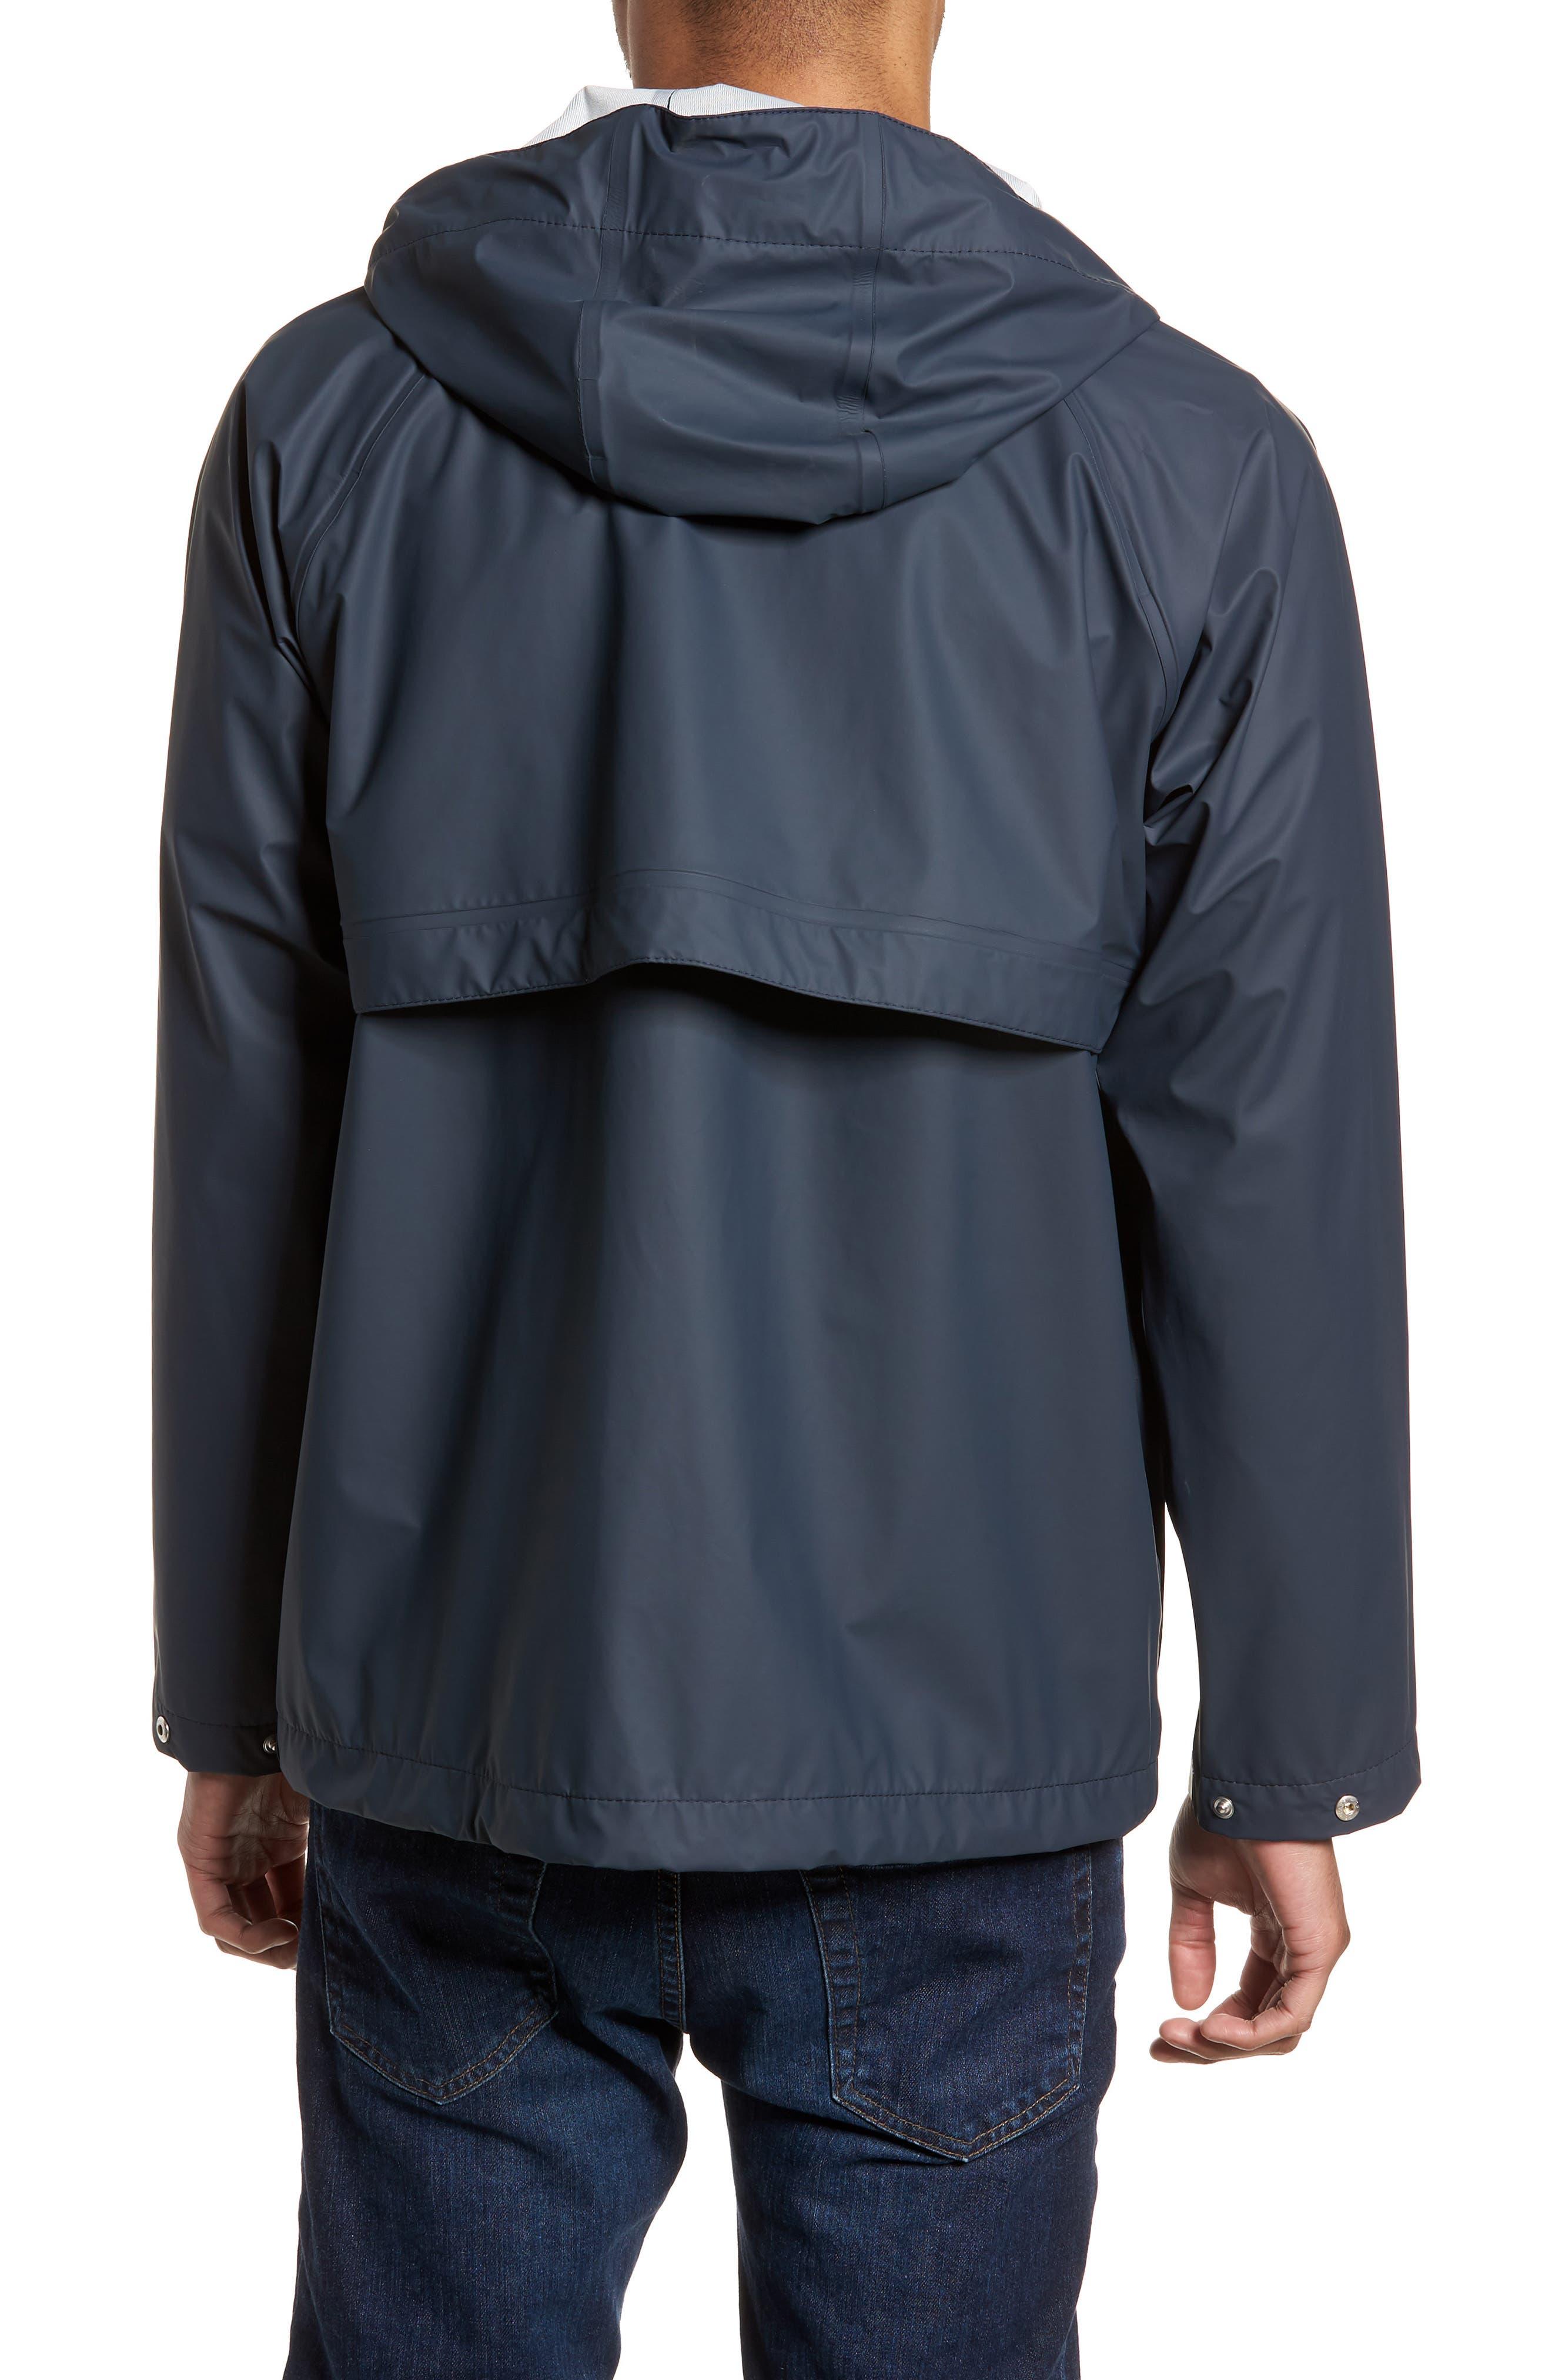 Stenhamra Classic Fit Jacket,                             Alternate thumbnail 2, color,                             NAVY